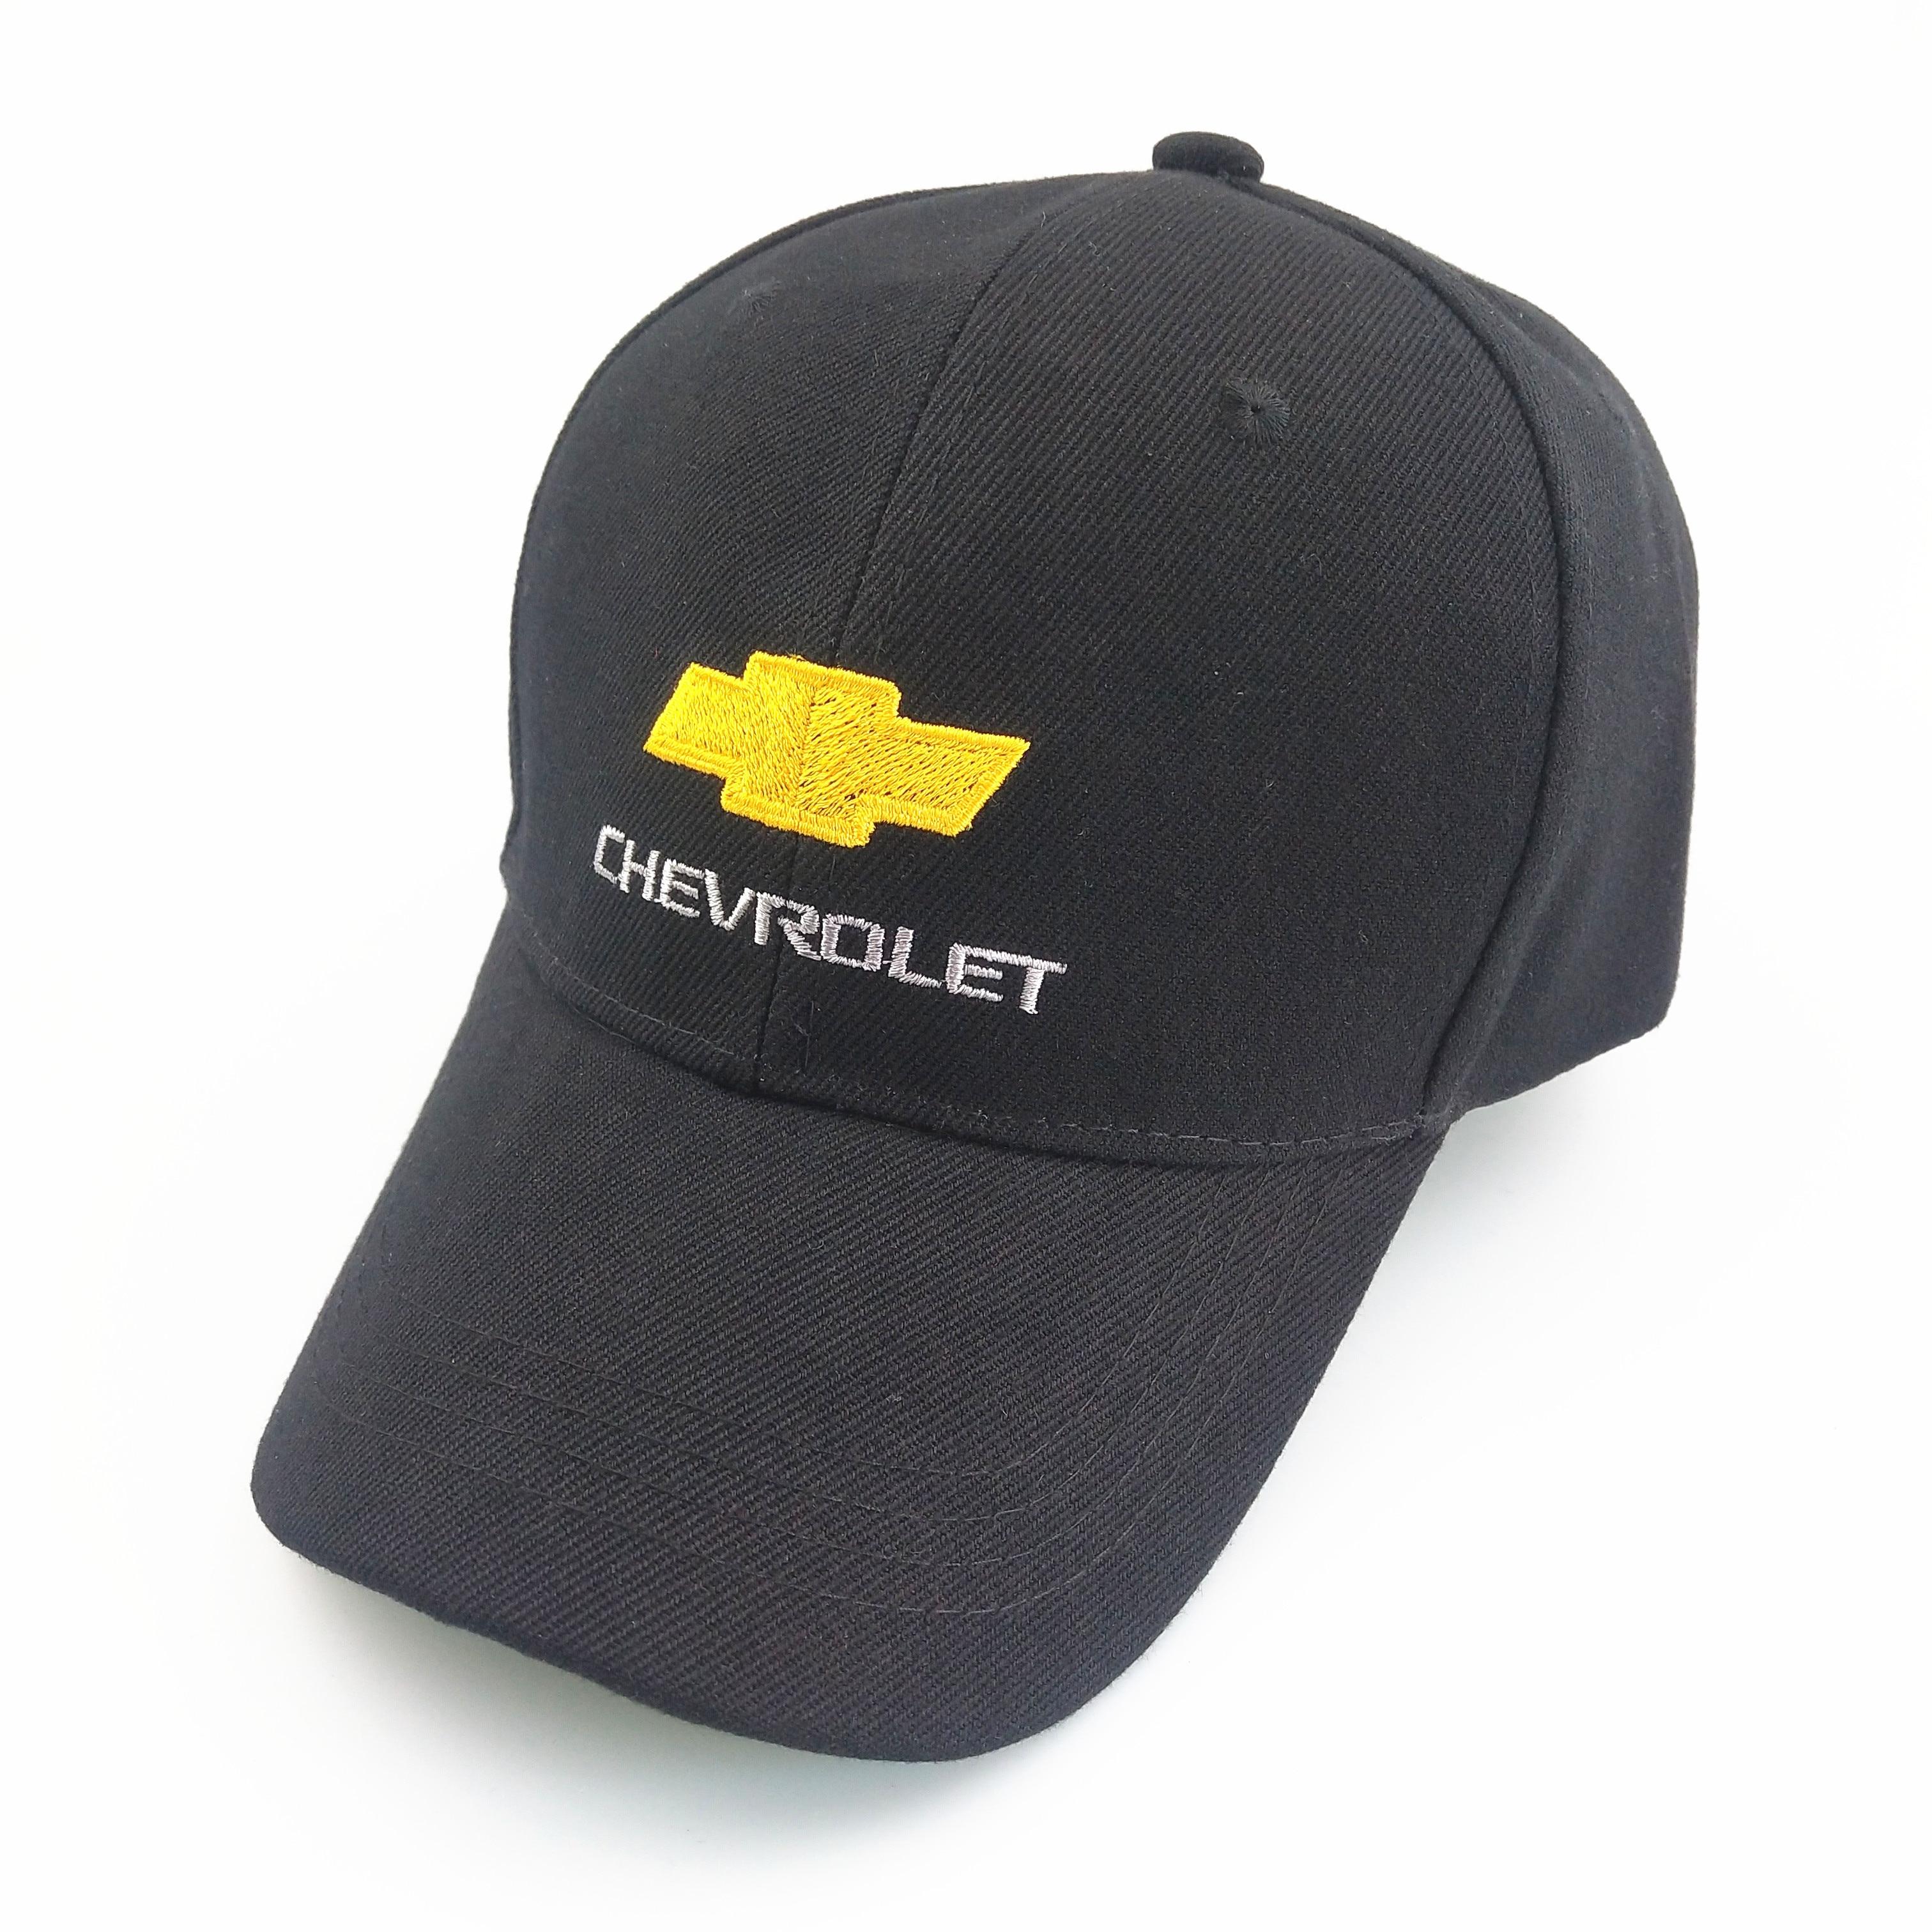 2019 Motorsports Outdoor Baseball Caps Hats Car Caps For Chevrolet Cruze Aveo Lacetti Captiva Niva Spark Orlando Epica Sail So